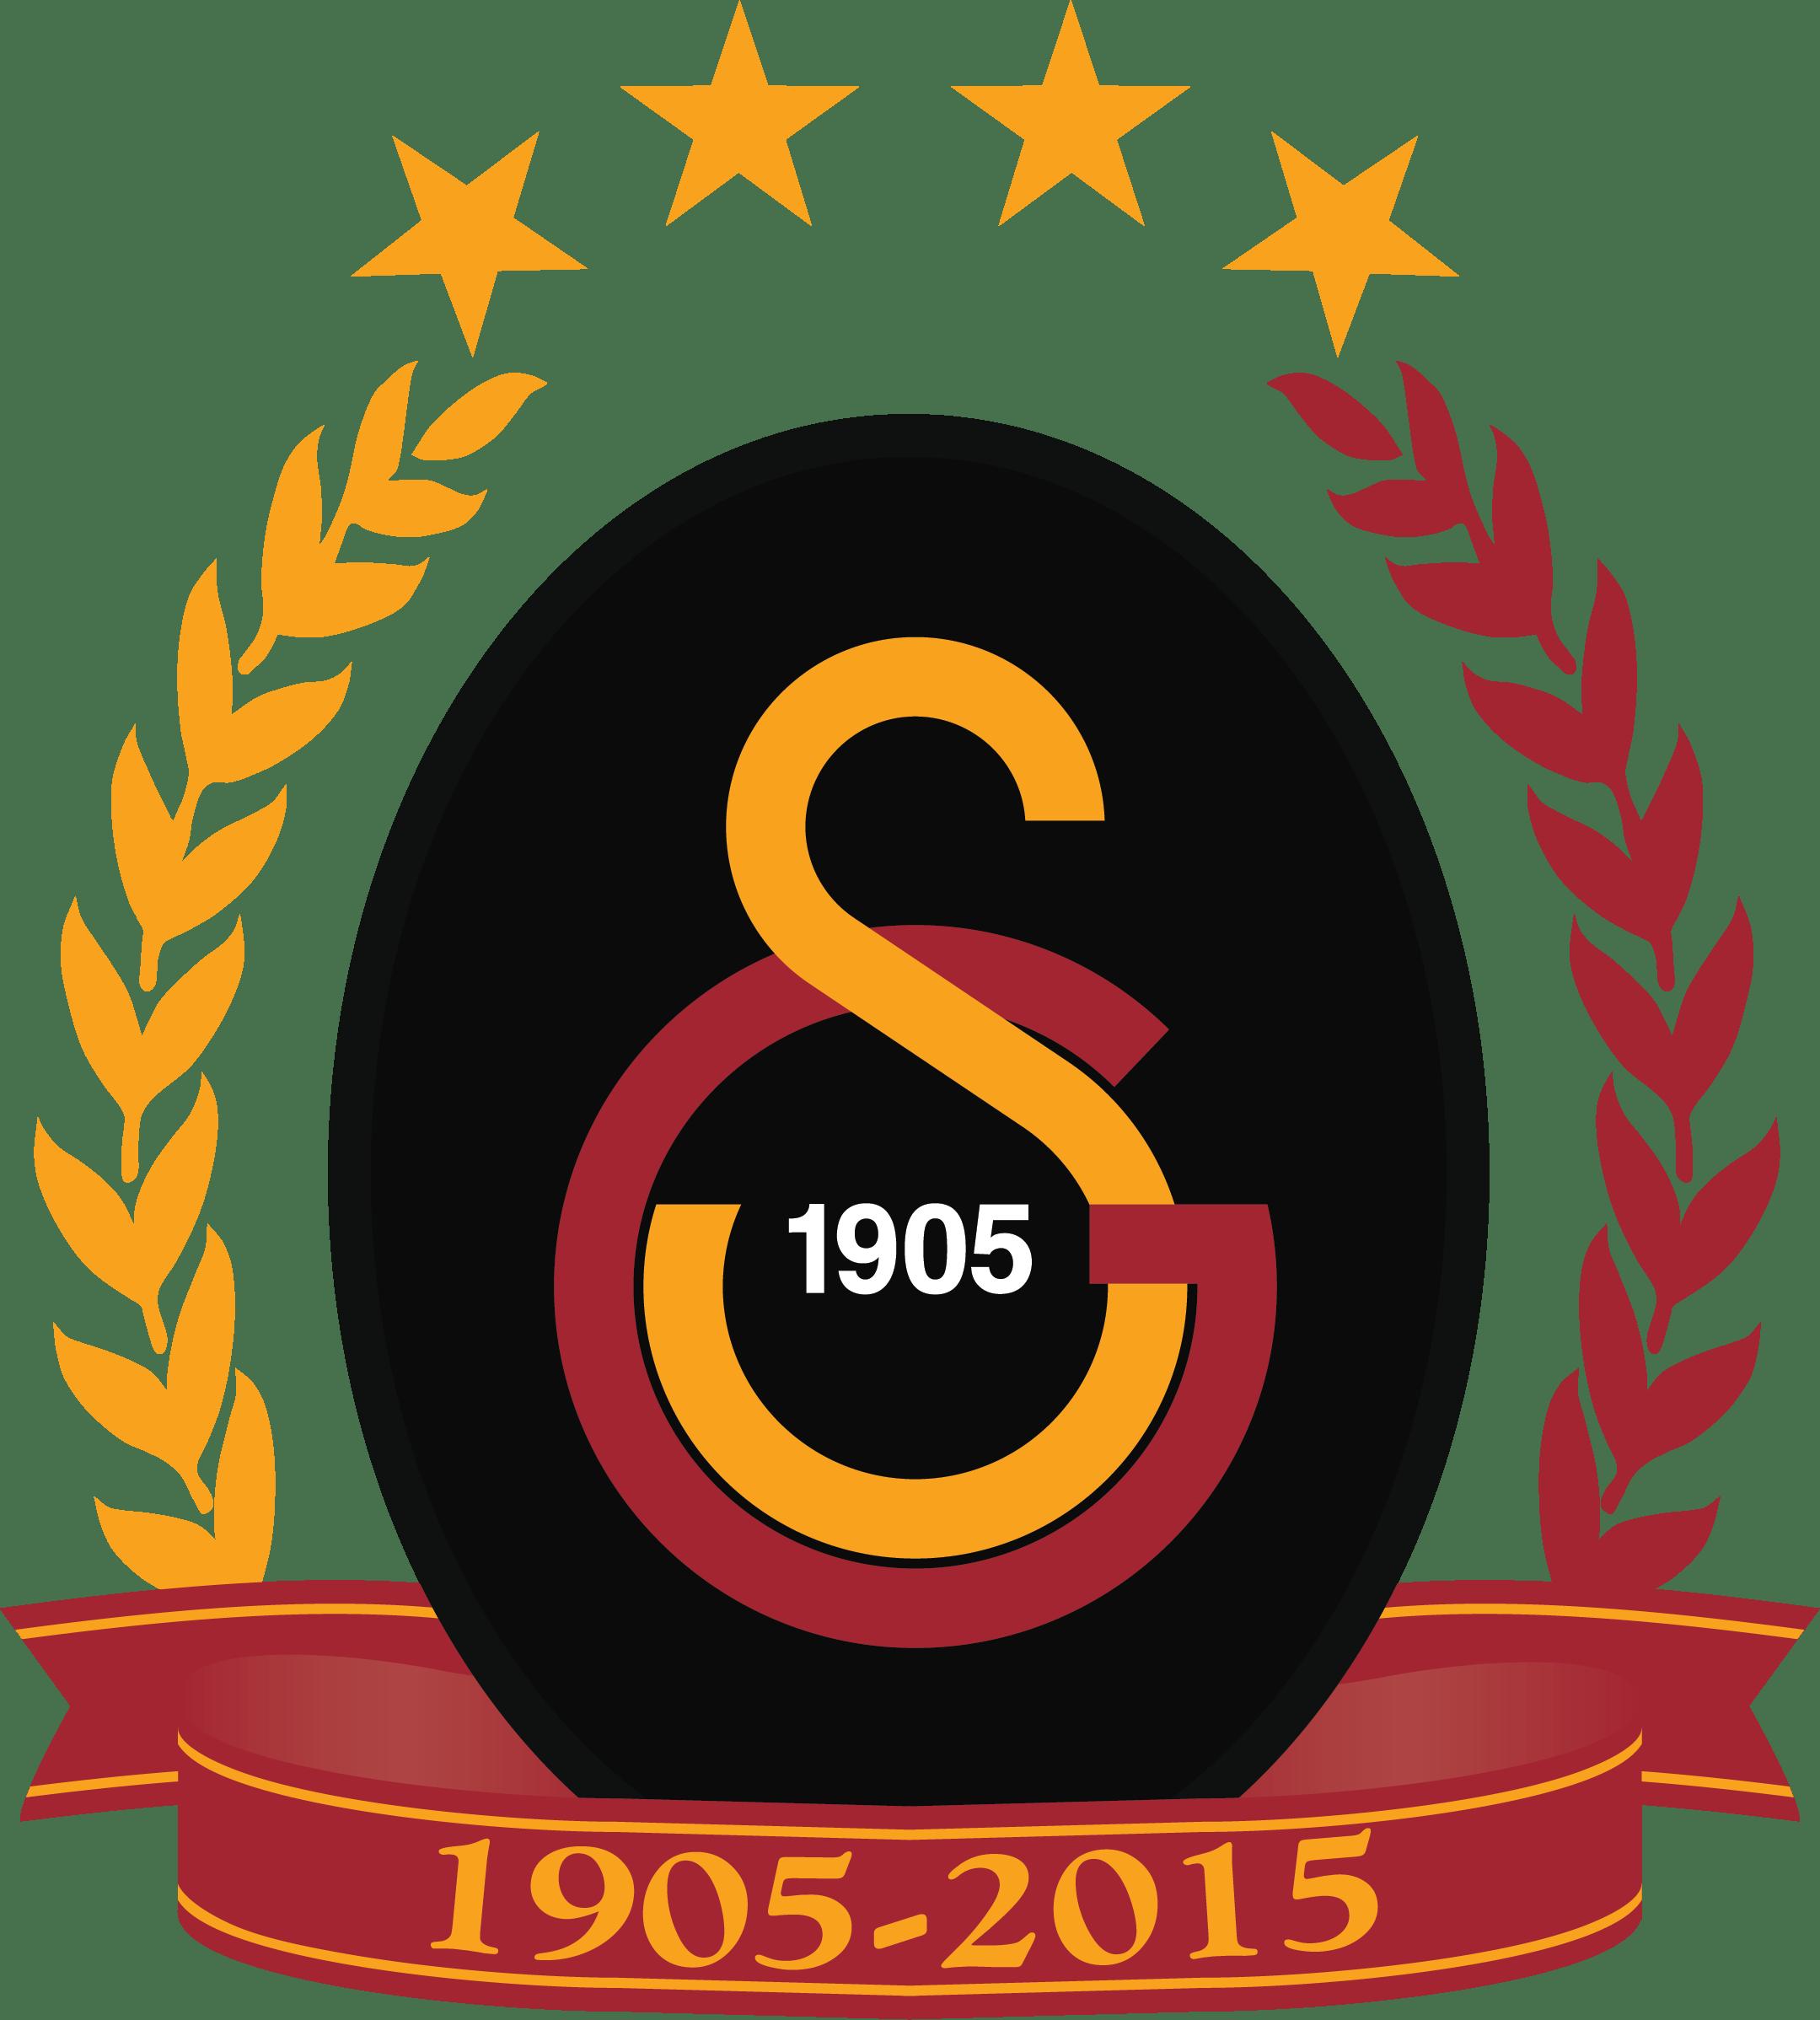 Galatasaray Logo Galatasaray Kits 512X512 Logo.